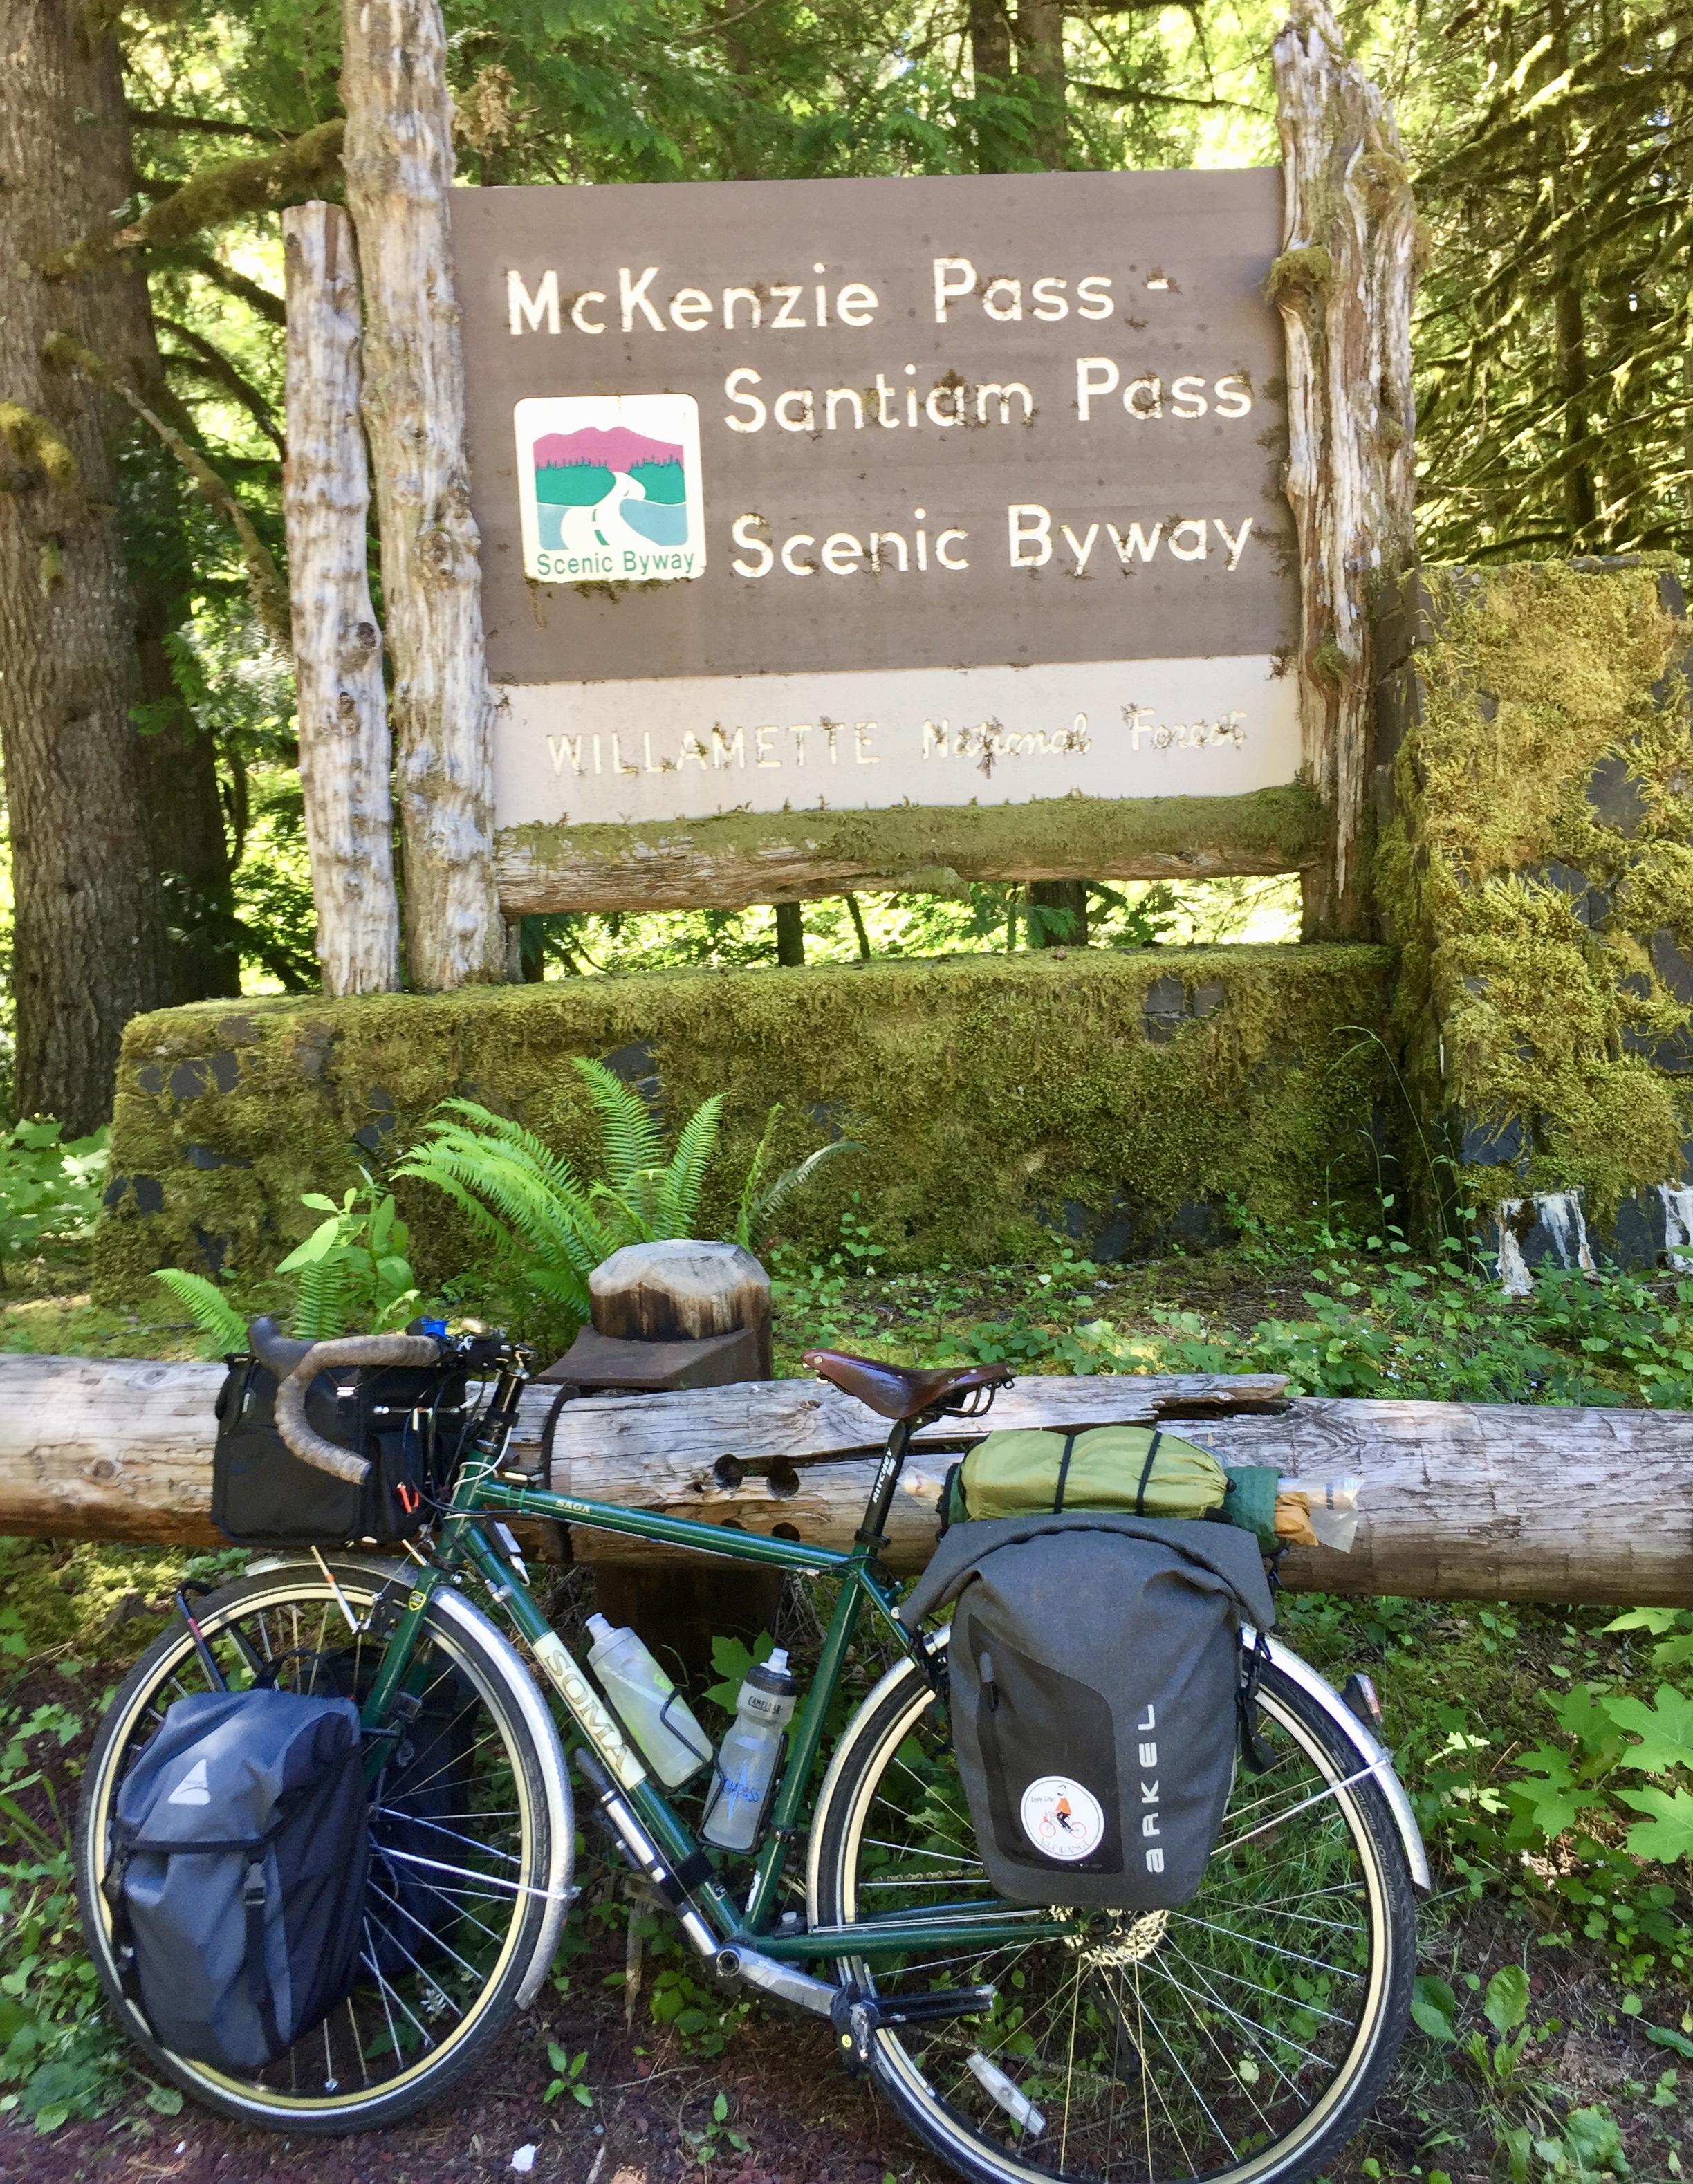 McKenzie Pass Scenic Byway